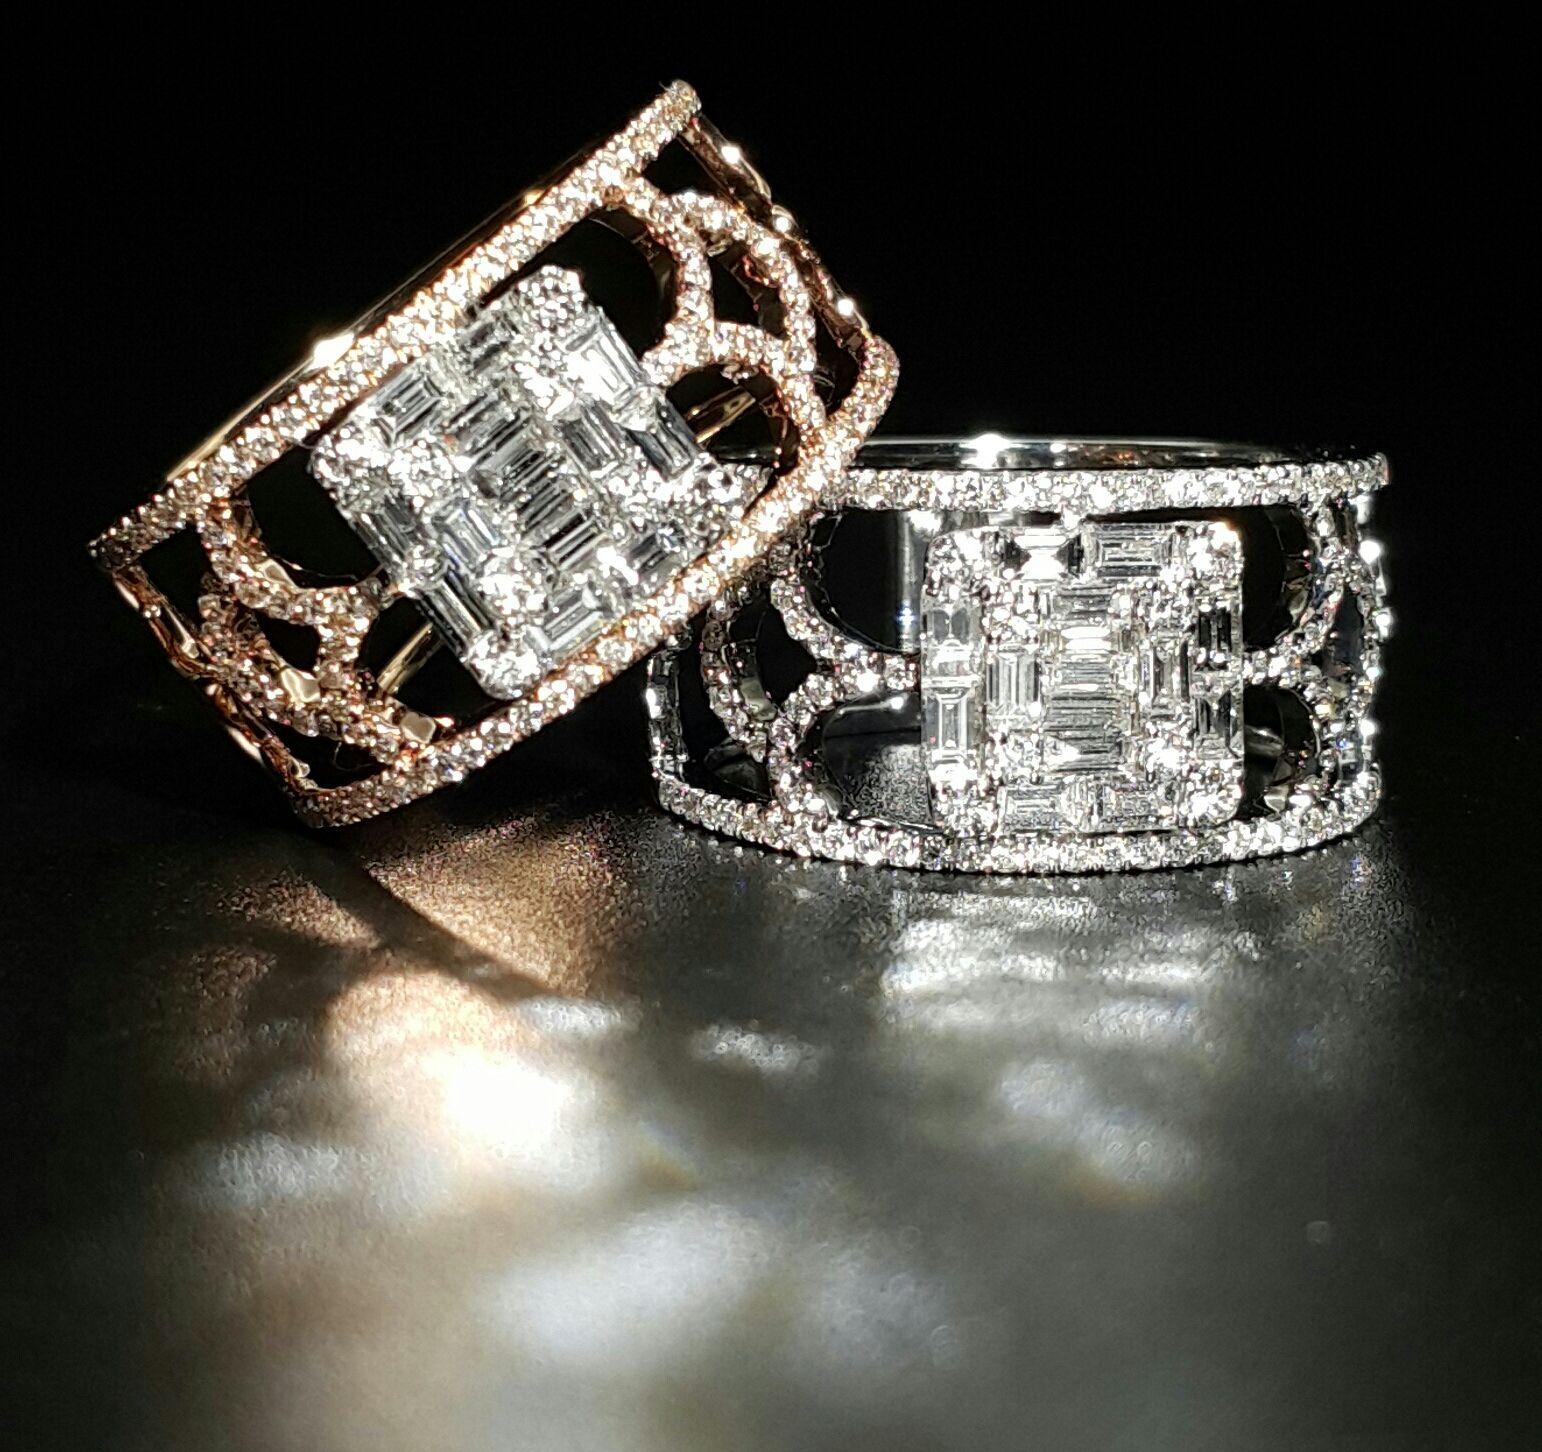 #Jewelryoftheday #Fashion #Trend #Vibes #Goodvibes #Wearable #Stylish #Inspiration #Art #Artistic